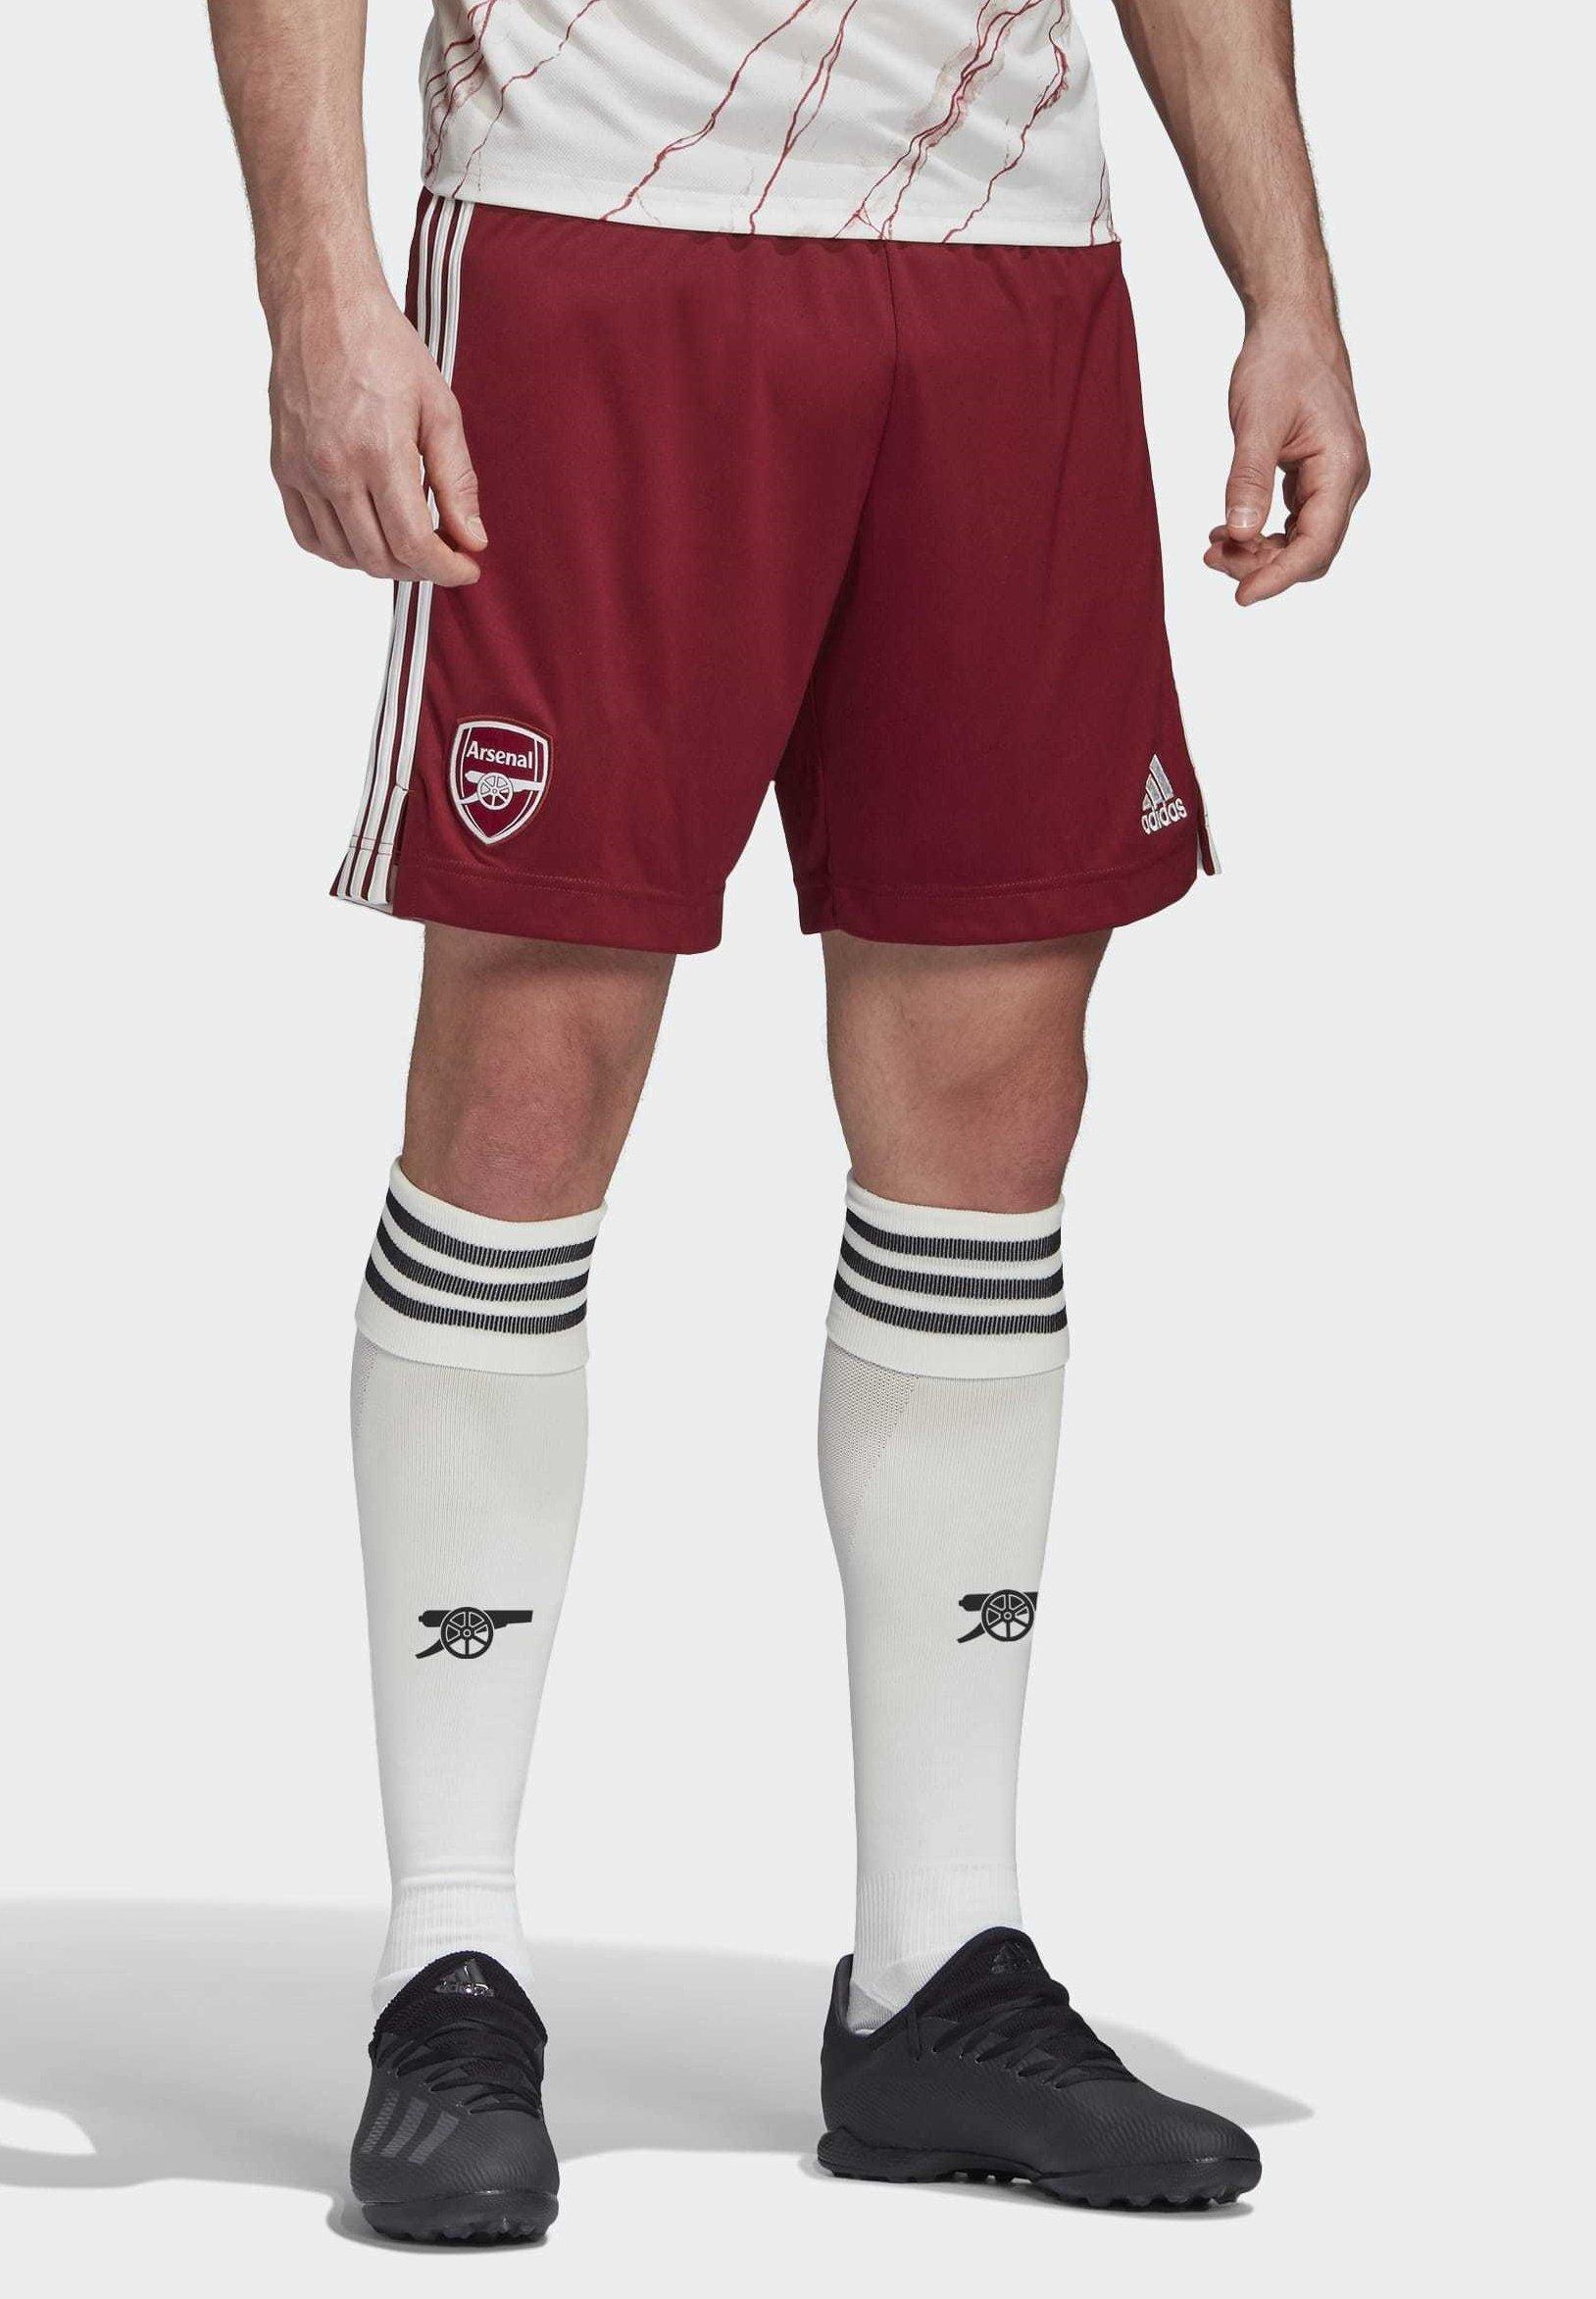 Herren ARSENAL FC AWAY AEROREADY SHORTS - kurze Sporthose